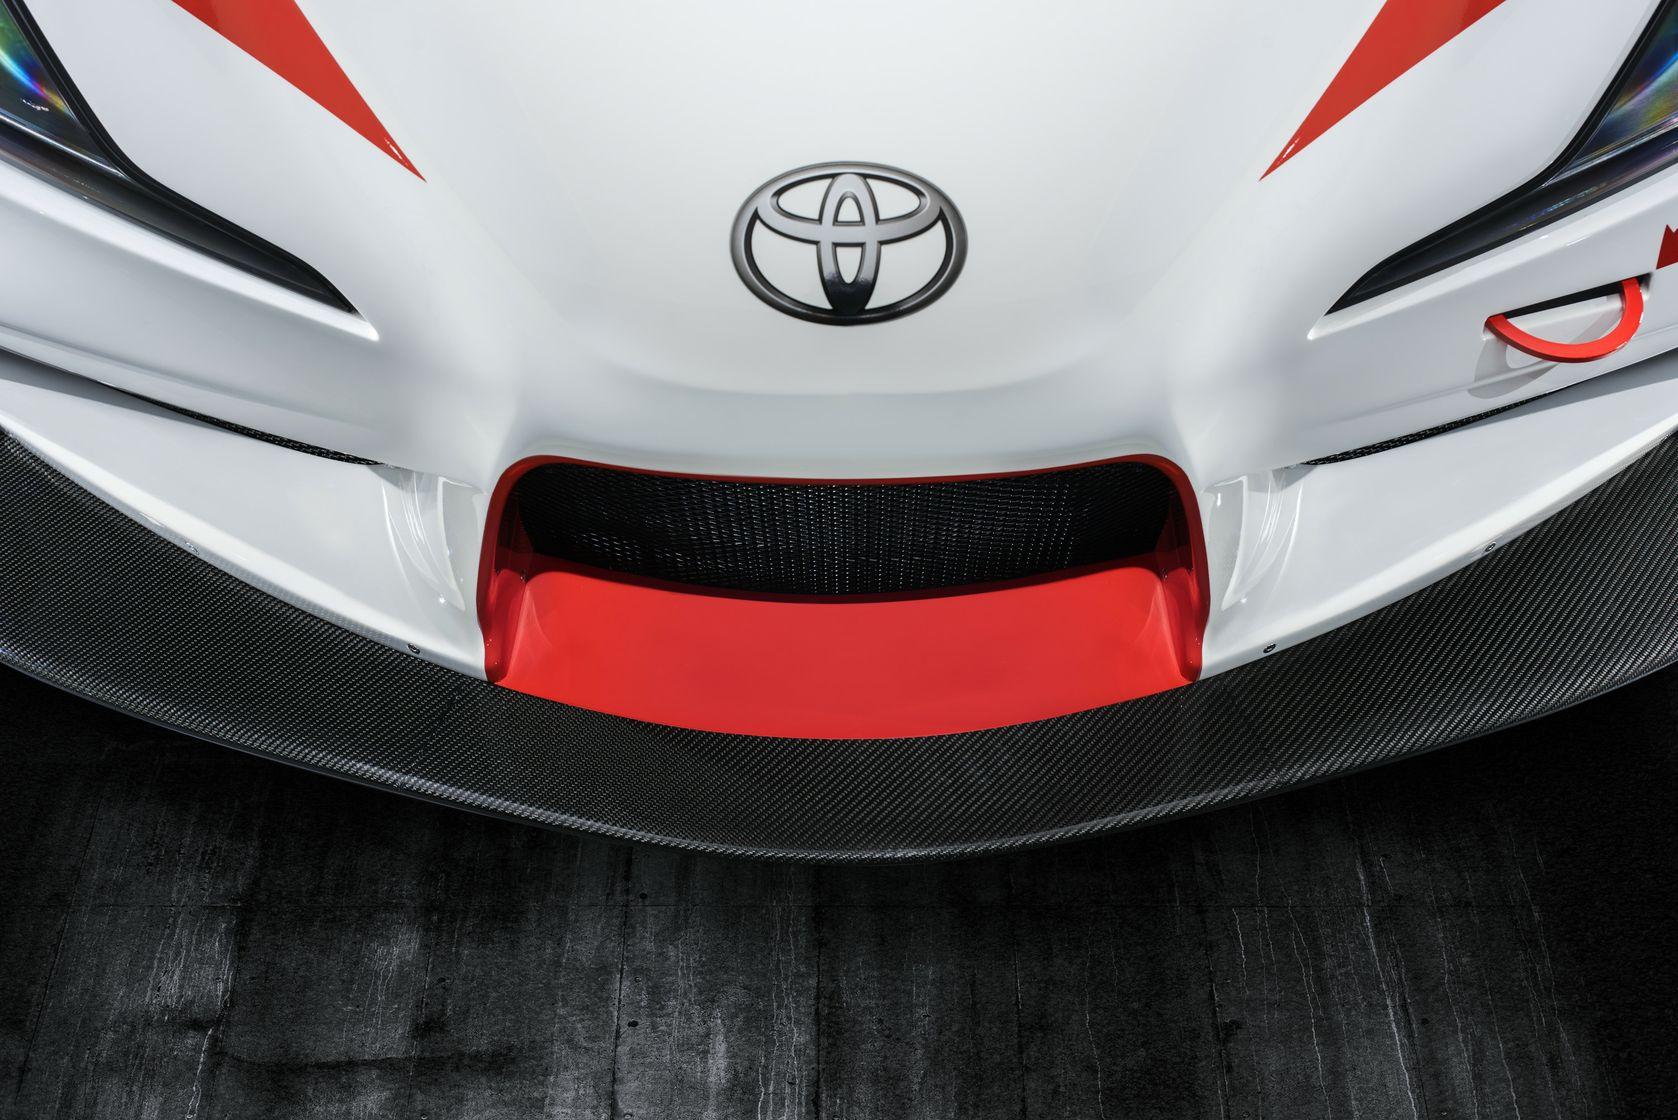 GR Supra Racing Concept - Exterior Details - 02